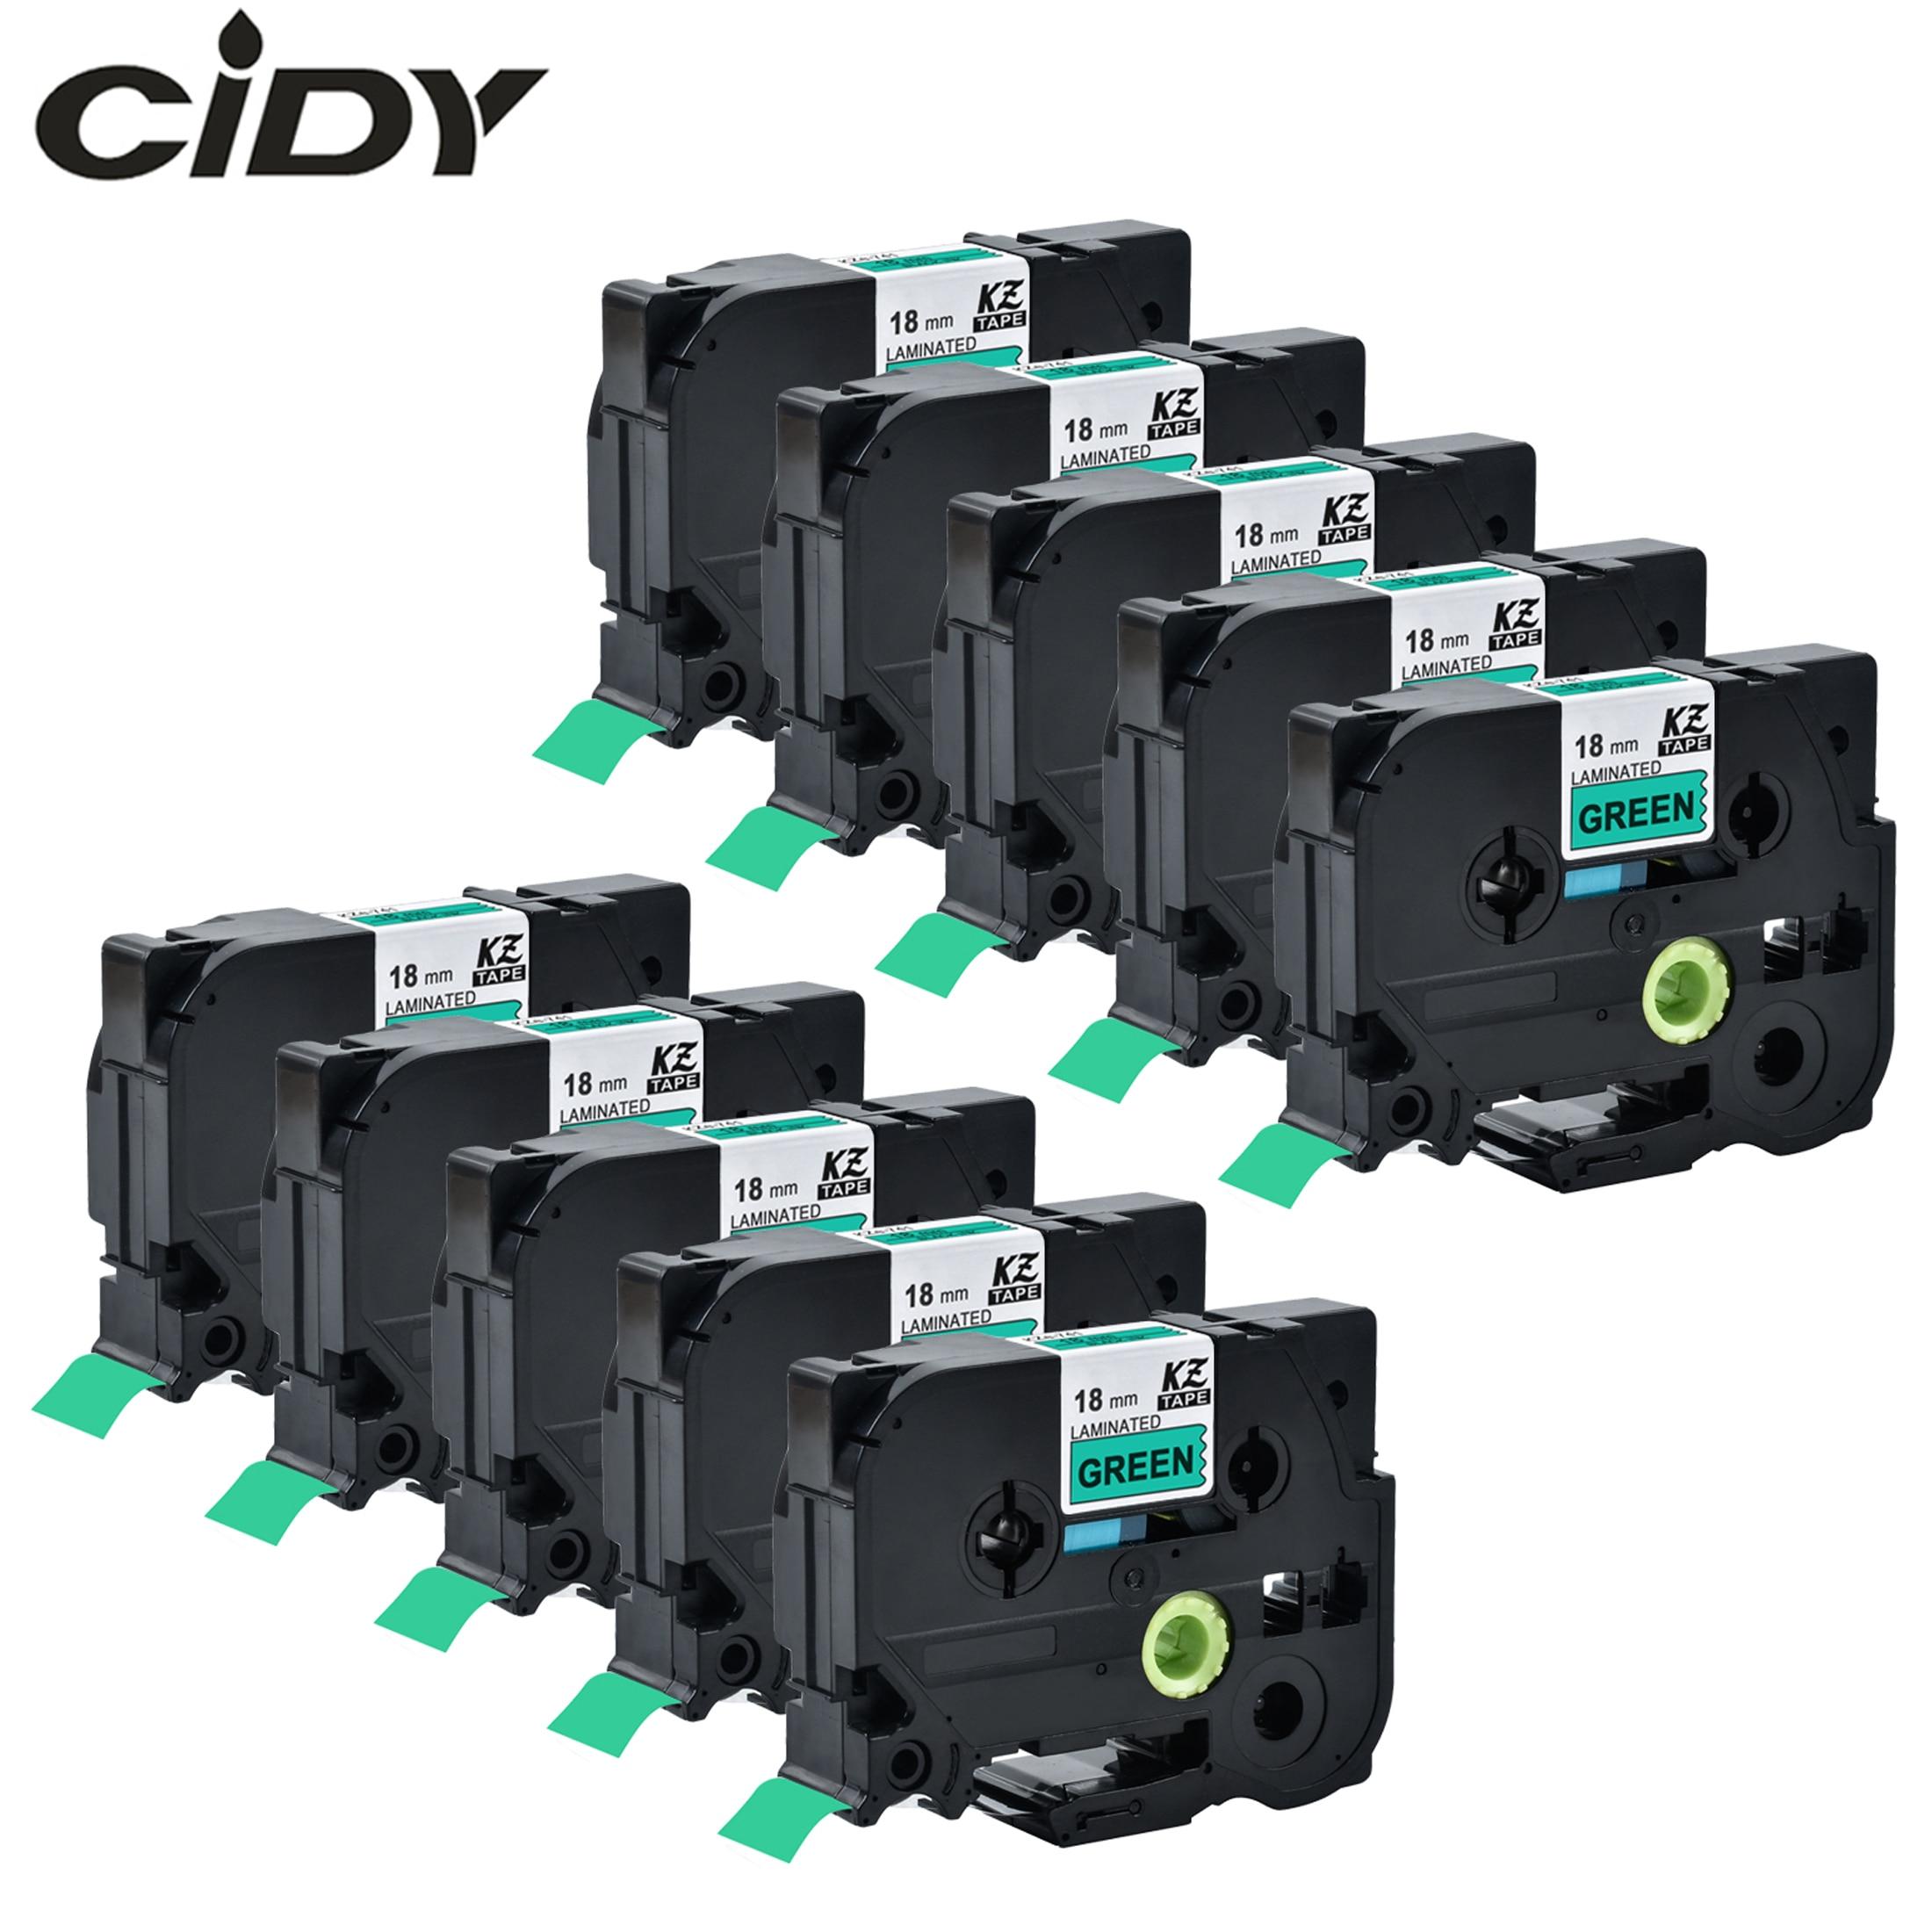 CIDY Black On Green 10pcs TZe741 TZe 741 TZ 741 TZ741 TZ-741 TZe-741 Laminated Adhesive Labels Tape Compatible For Brother